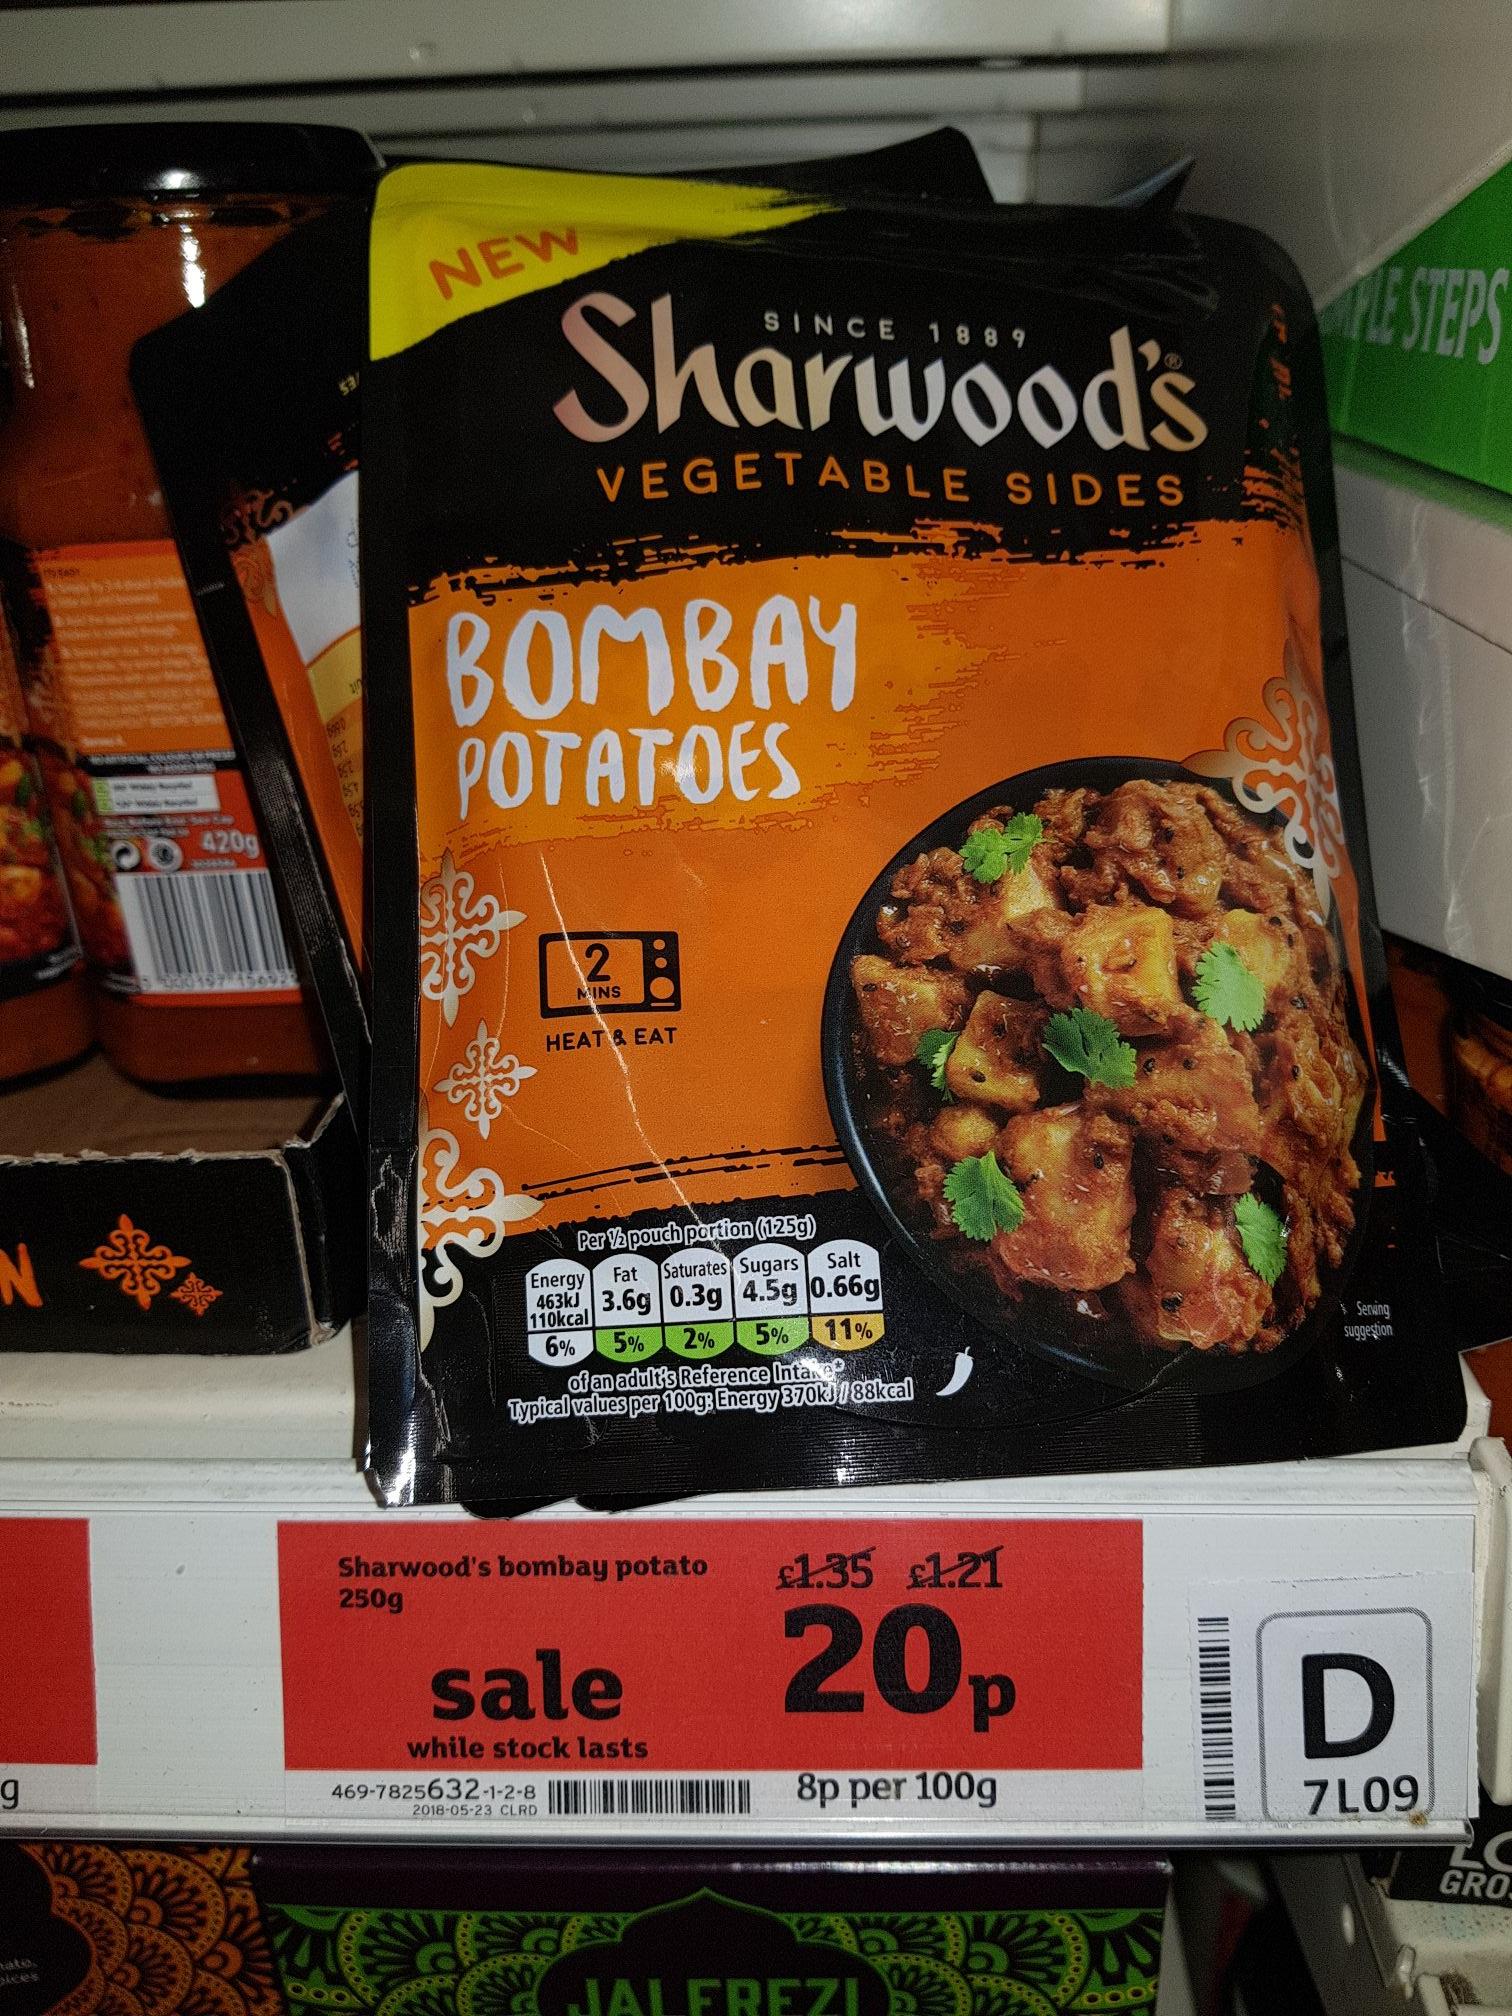 Sharwood Bombay potatoes 20p at Sainsbury's Worcester blackpole